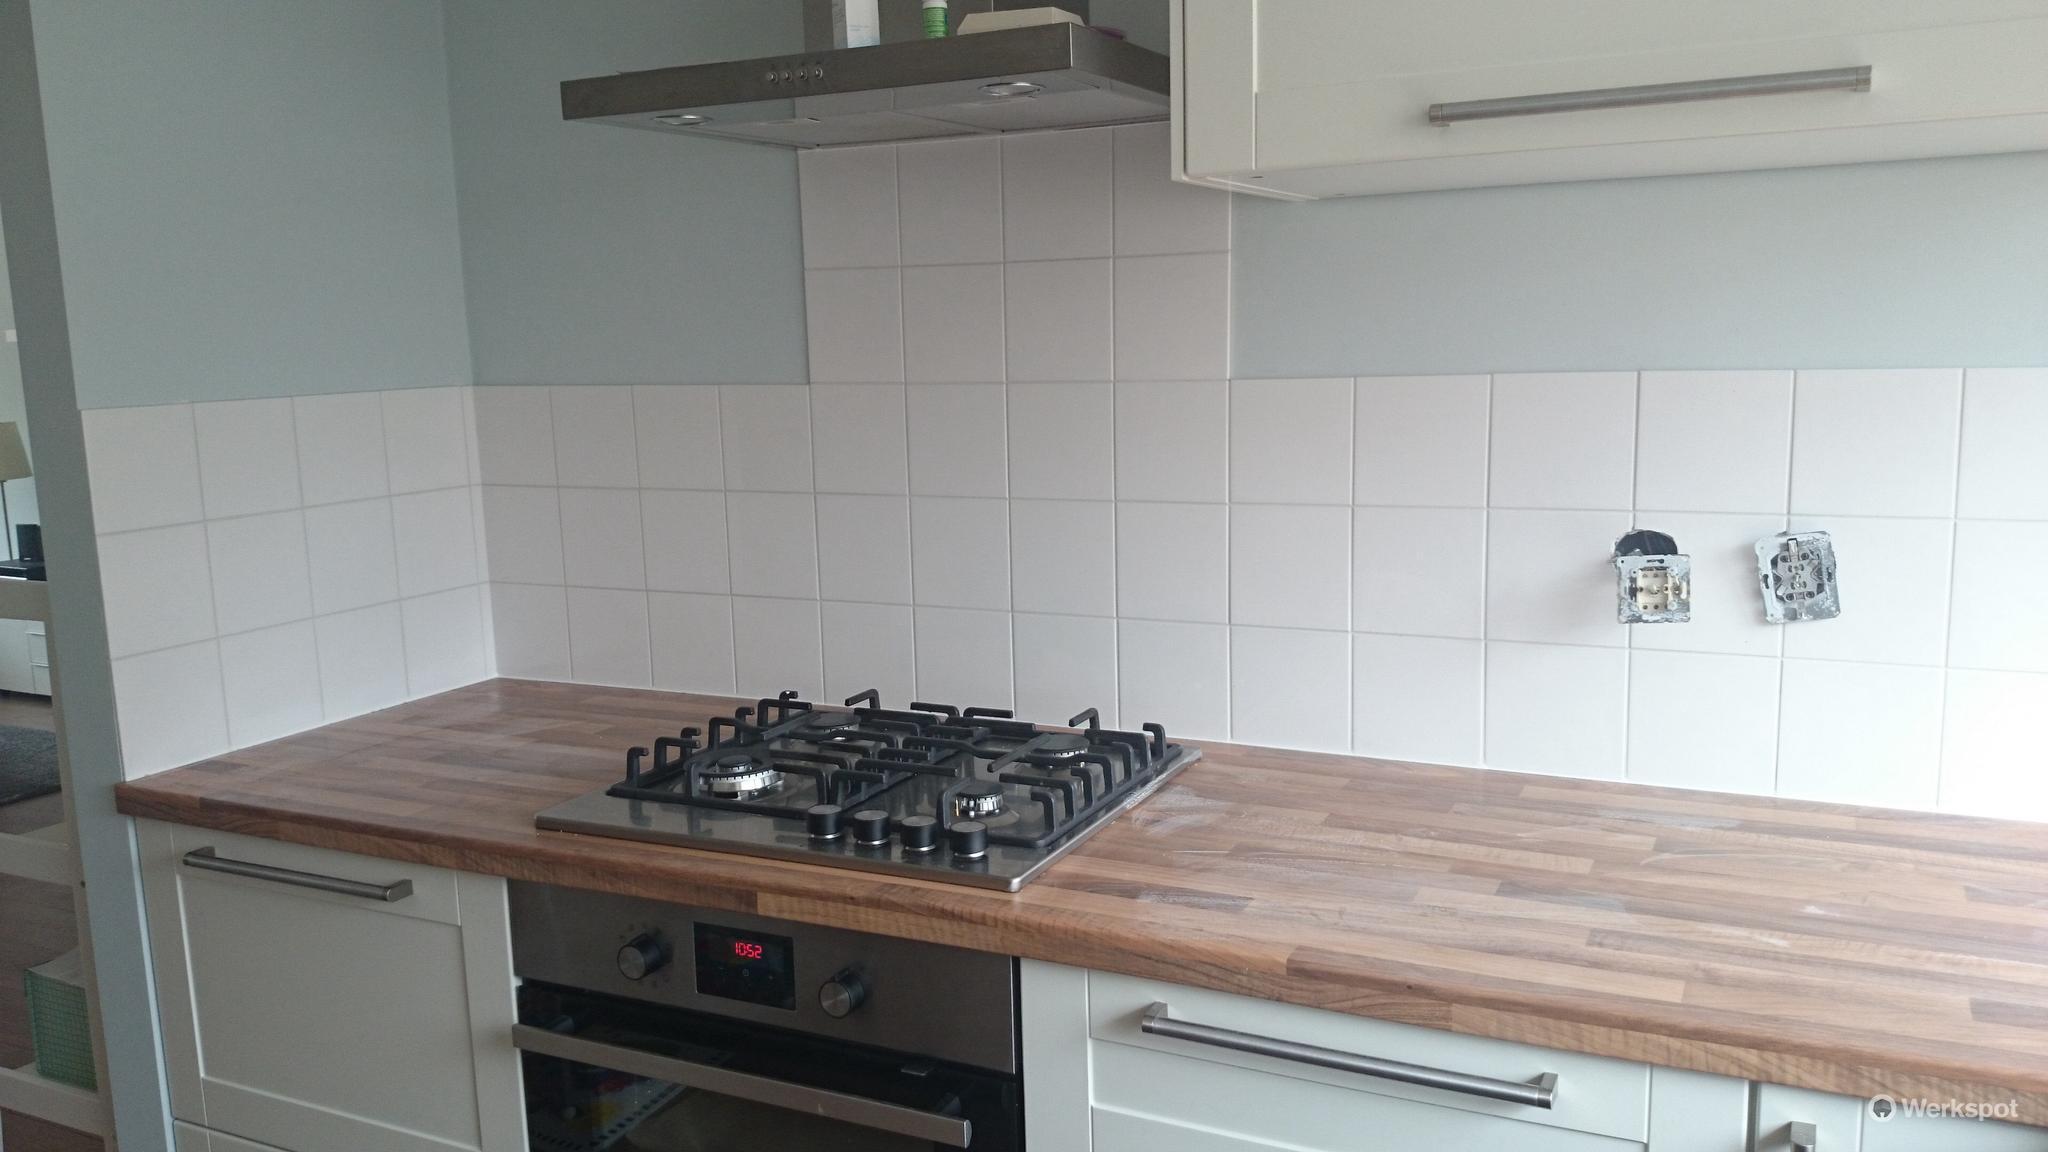 keuken tegels afkitten : Wandtegels Keuken Afkitten Keuken Ca 2 5 M2 Werkspot